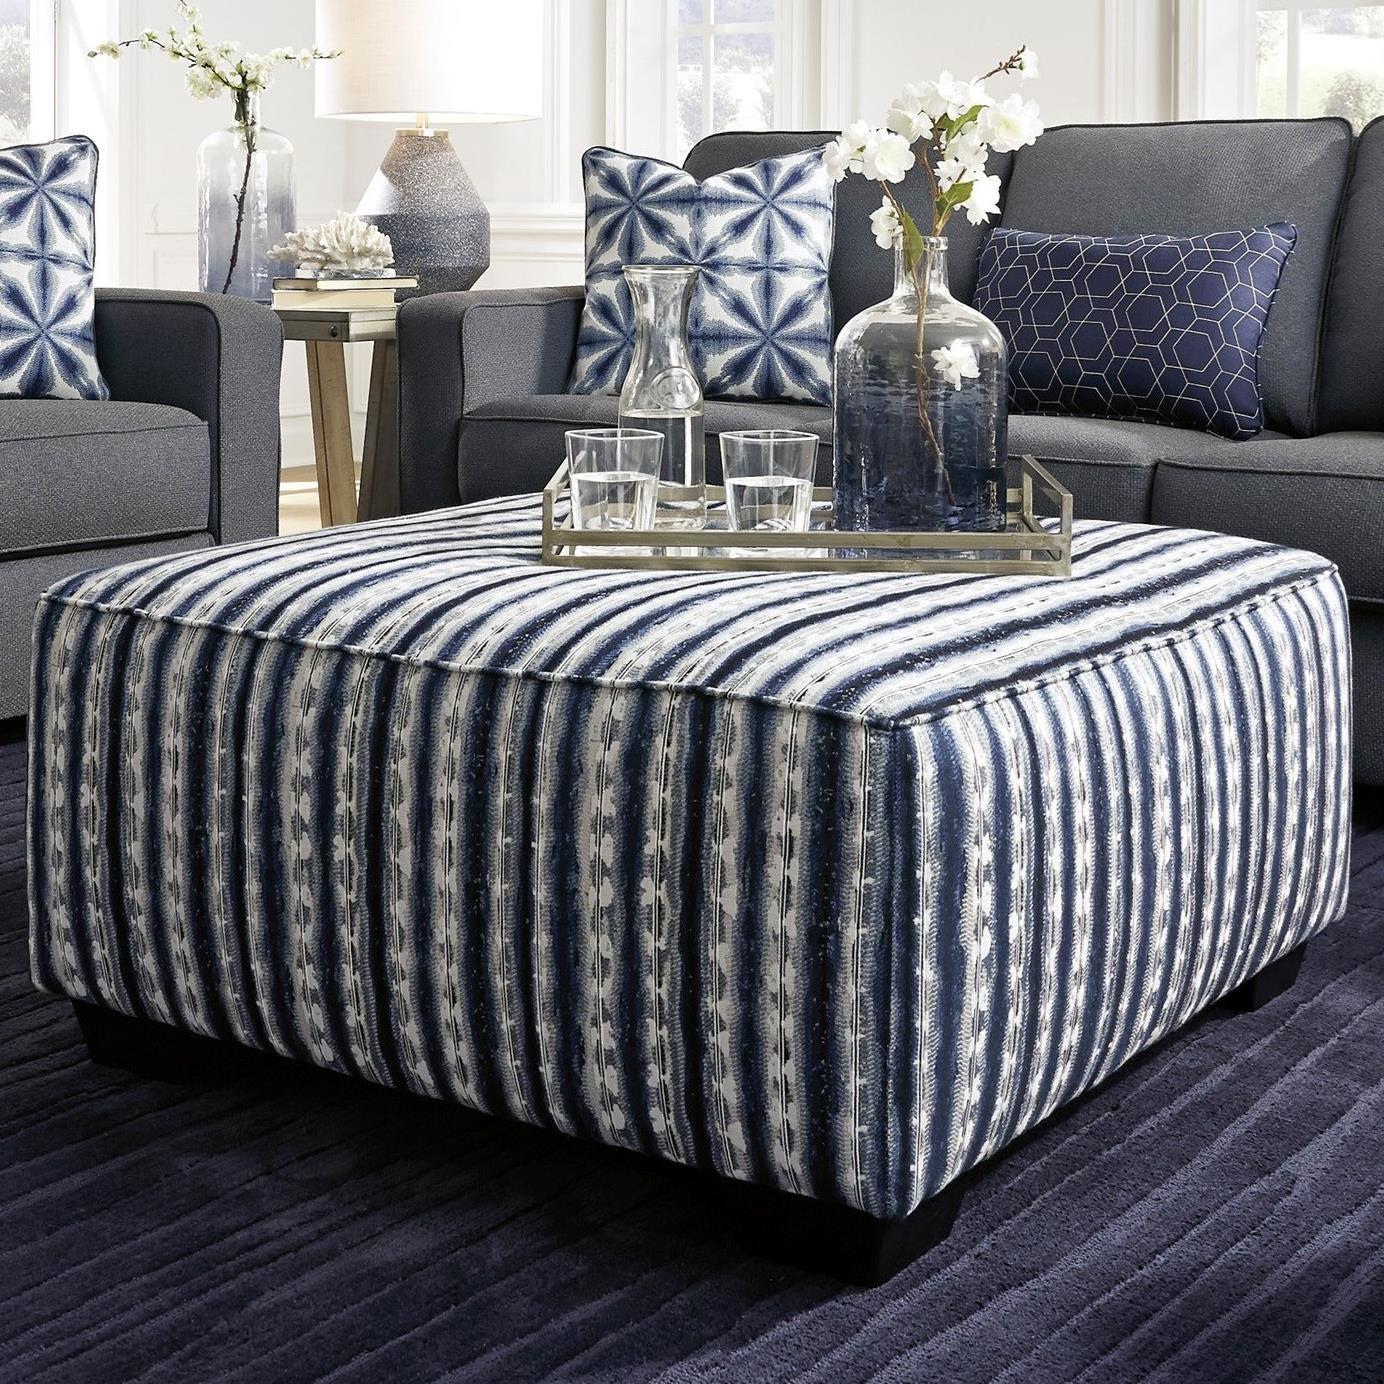 Kiessel Nuvella Ottoman by Benchcraft at HomeWorld Furniture